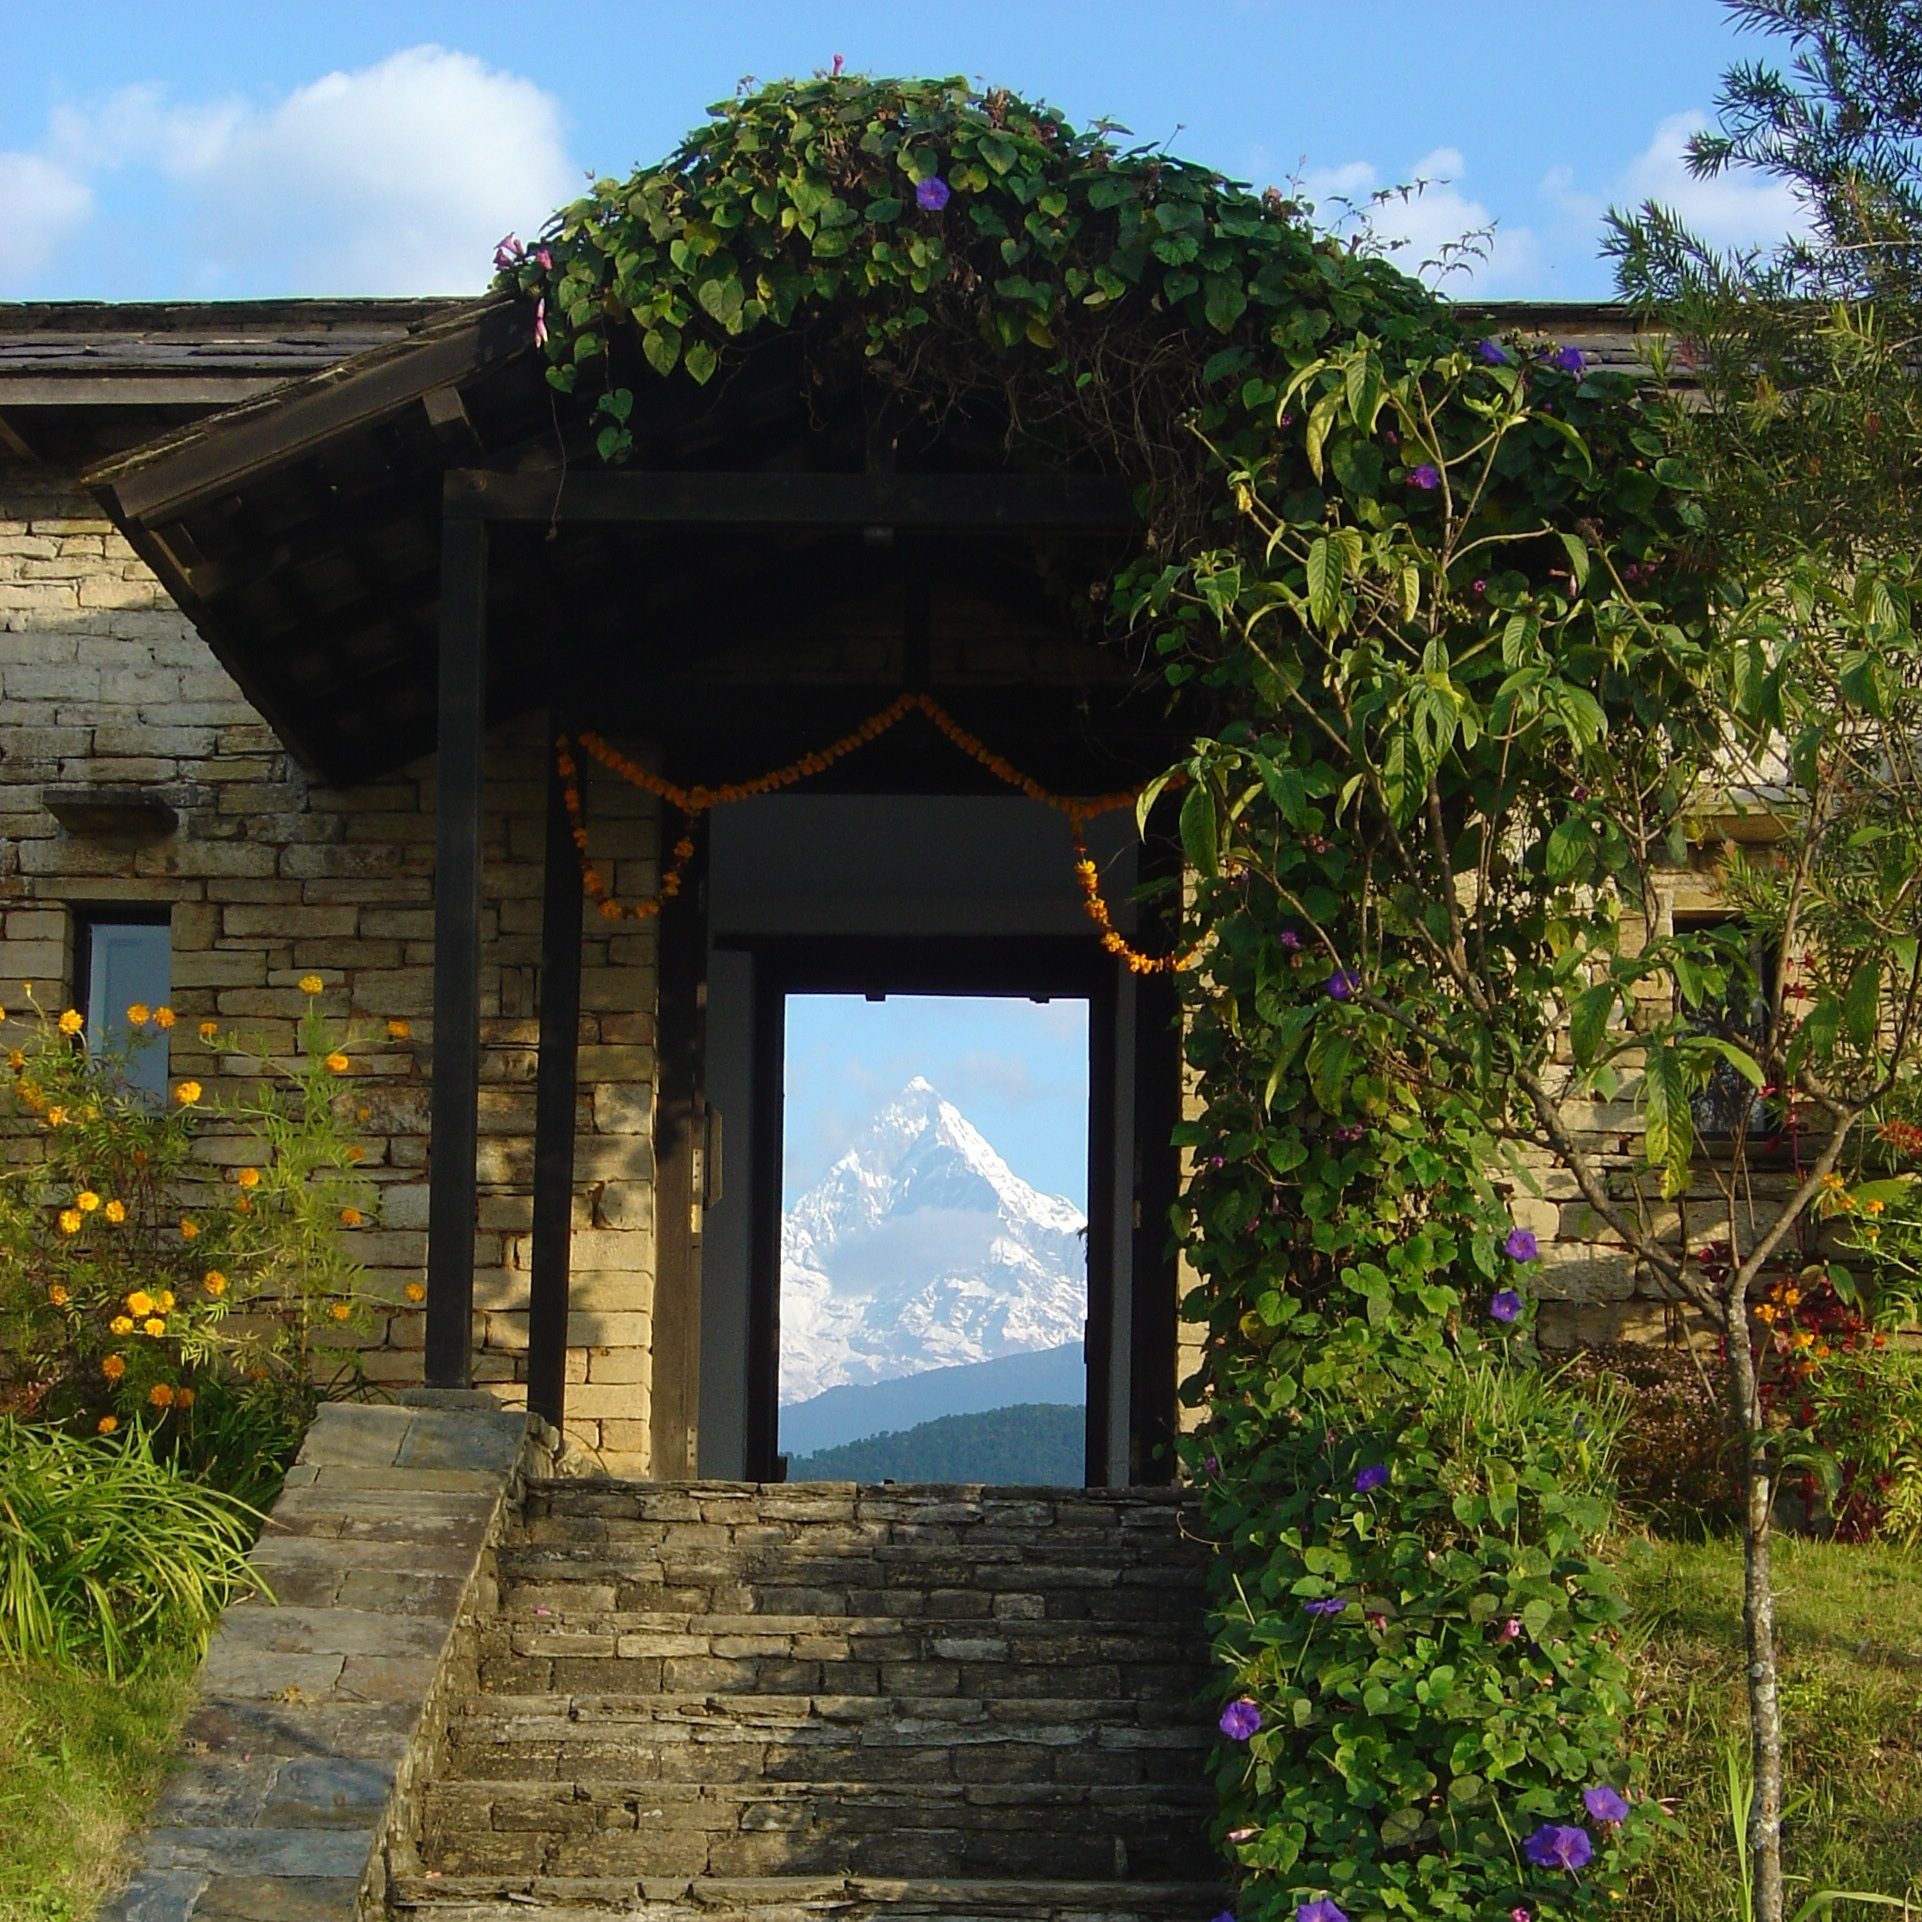 Nepal-Tiger-Mountain-Pokhara-Lodge-Main Entrance - Plowman.jpg